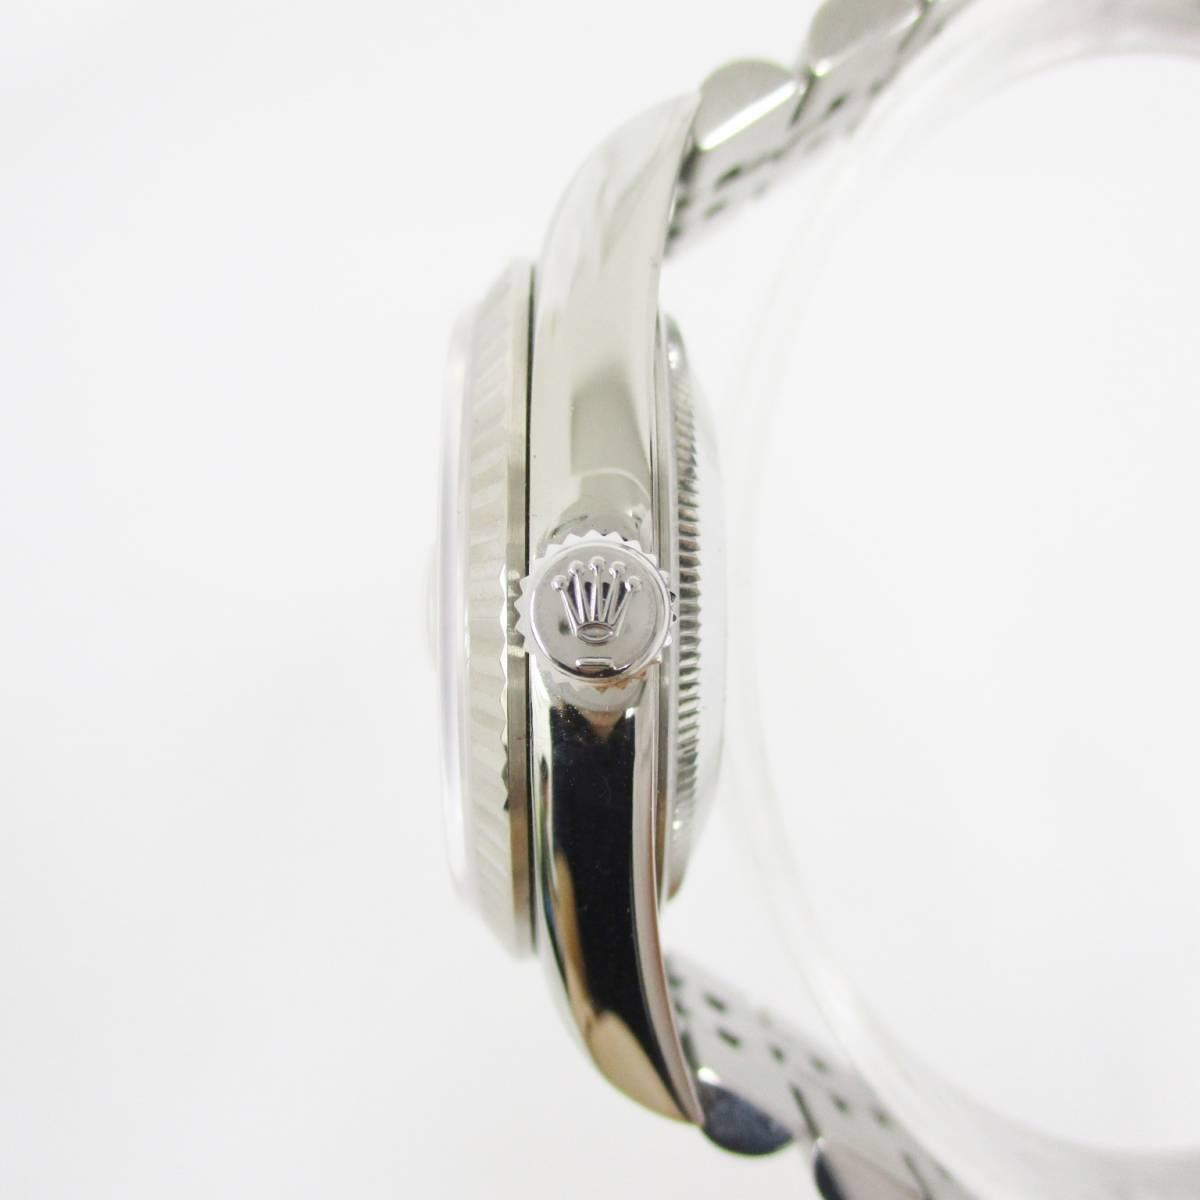 ROLEX ロレックス OYSTER PERPETUAL オイスターパーペチュアル DATEJUST デイトジャスト 16234 T番 メンズ 腕時計 自動巻き 大ReB08 0522 2_画像2